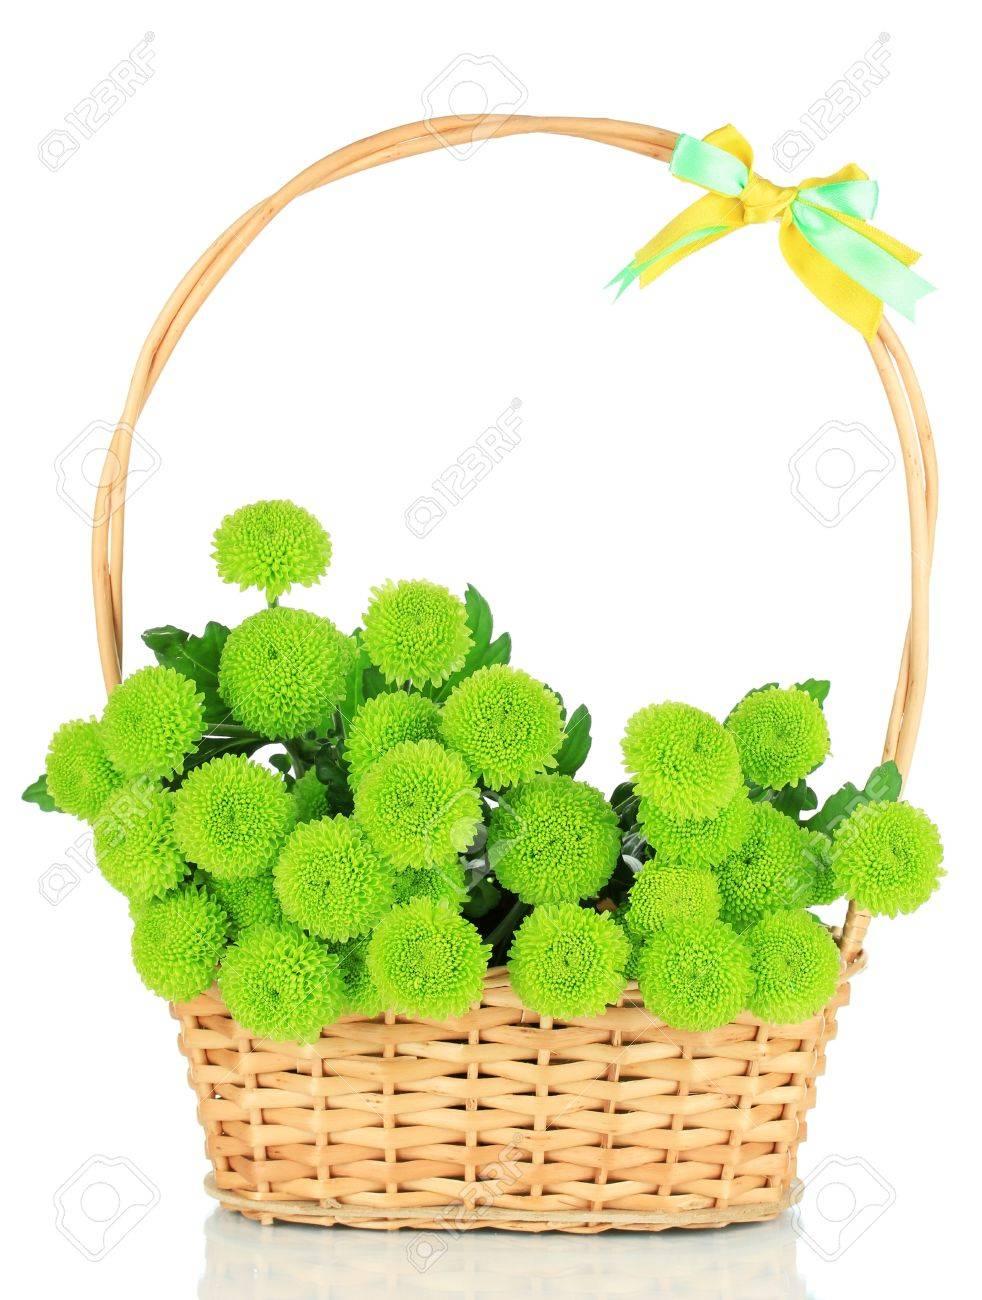 Beautiful green chrysanthemum in wicker basket isolated on white Stock Photo - 21003505